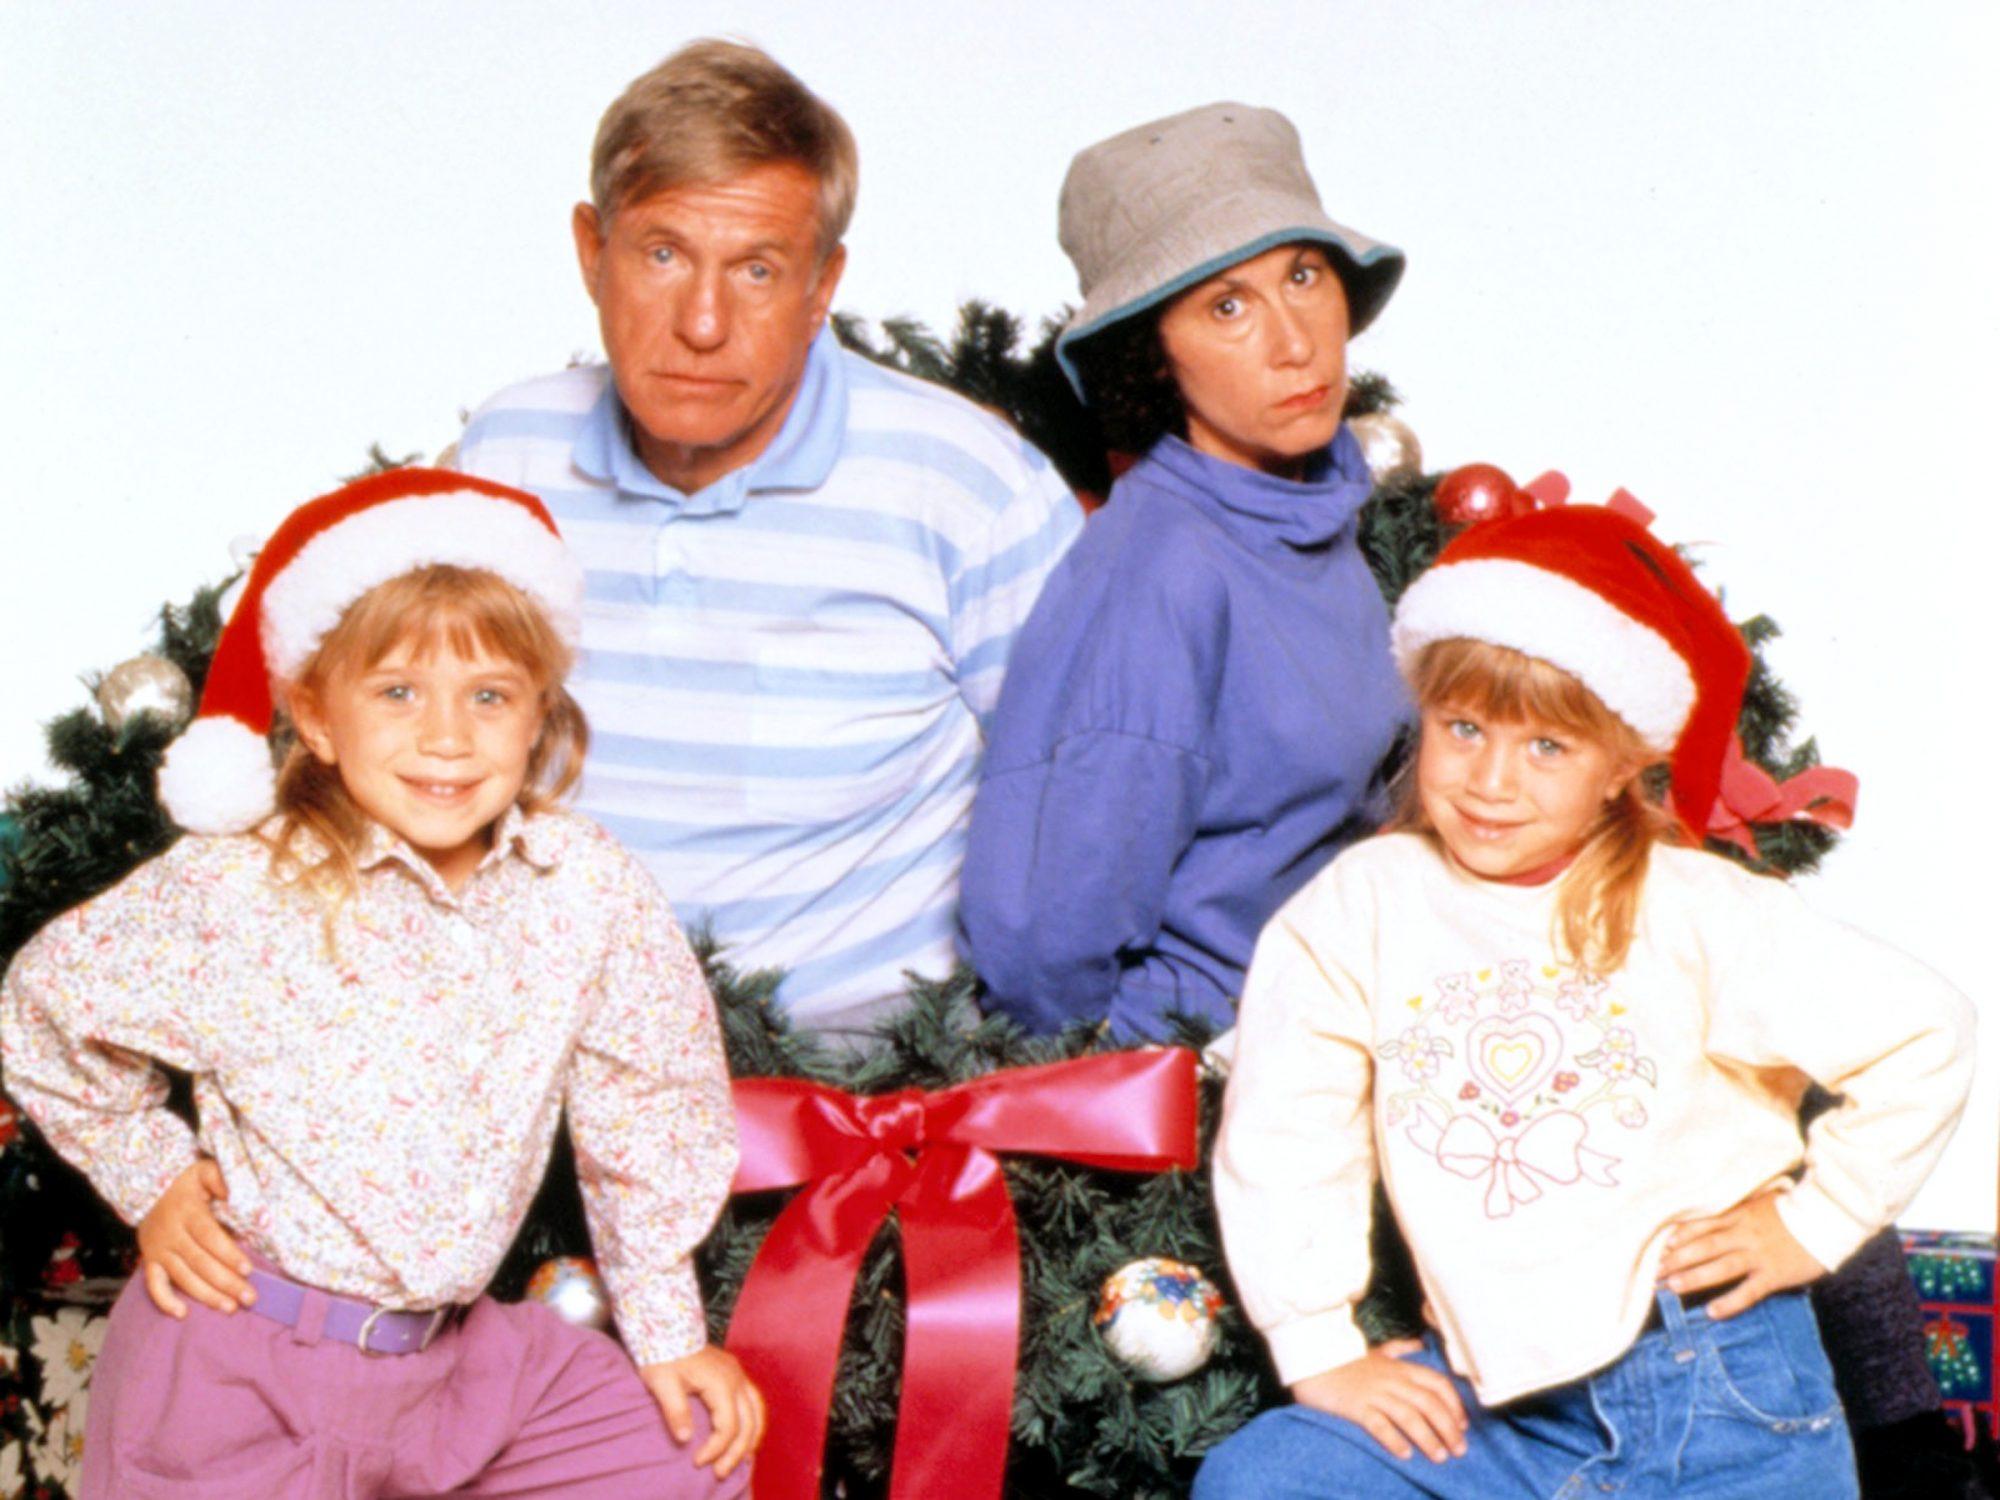 TO GRANDMOTHER'S HOUSE WE GO, Olsen Twins (Mary Kate & Ashley), Jerry Van Dyke, Rhea Perlman, 1992